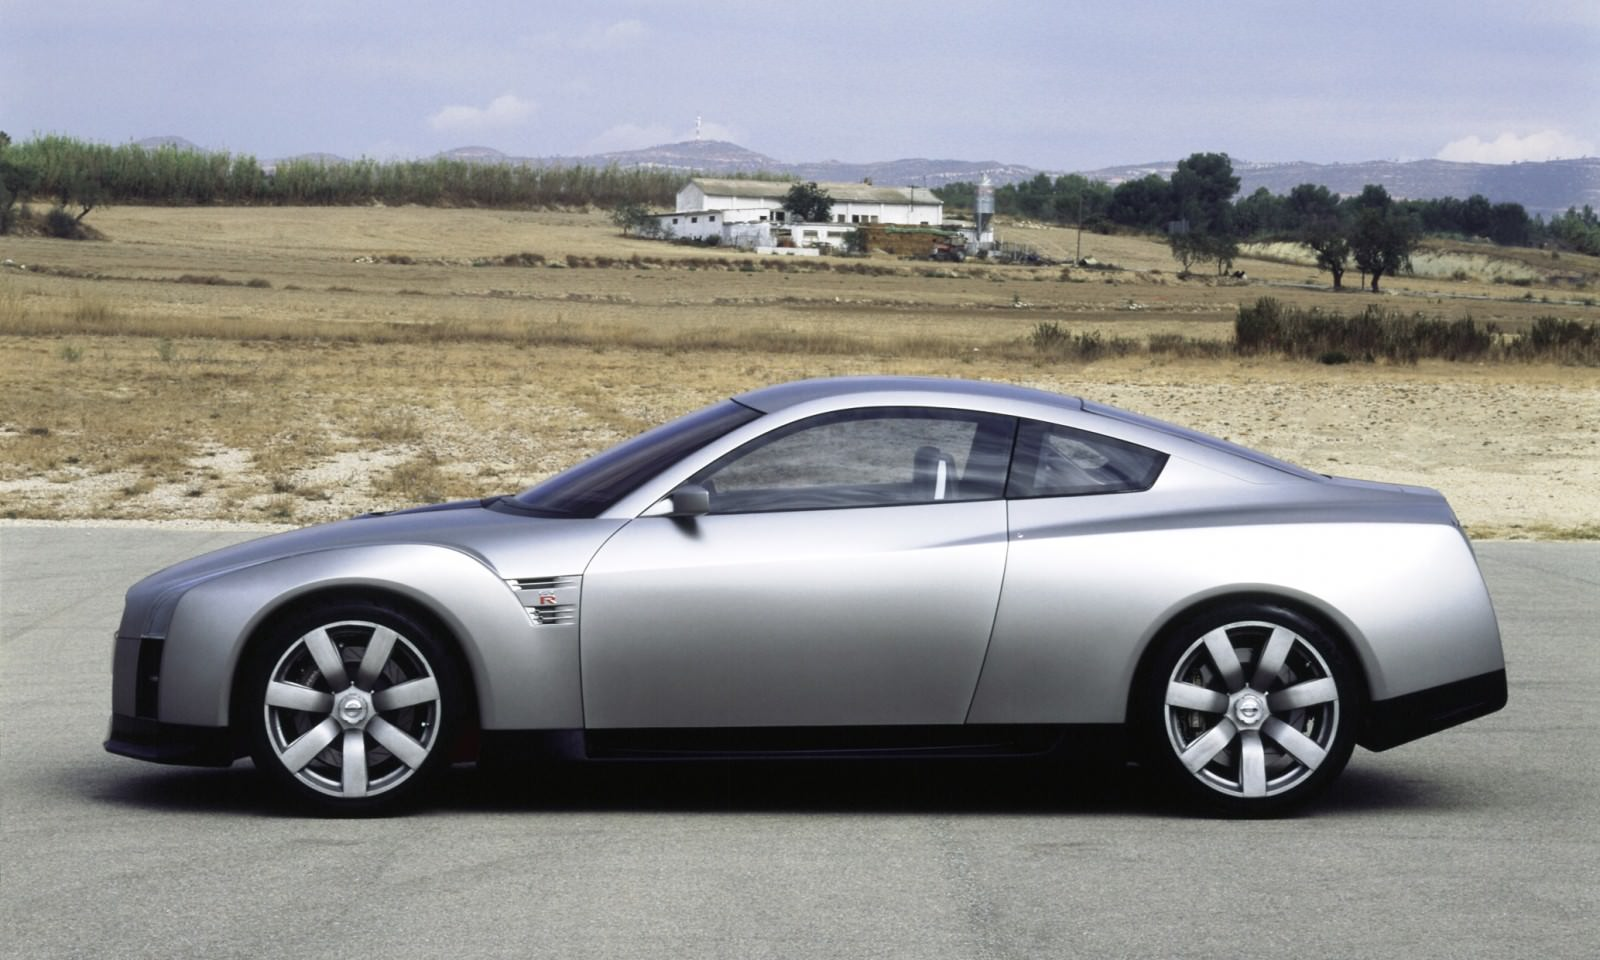 2001 Nissan GT-R Prototype